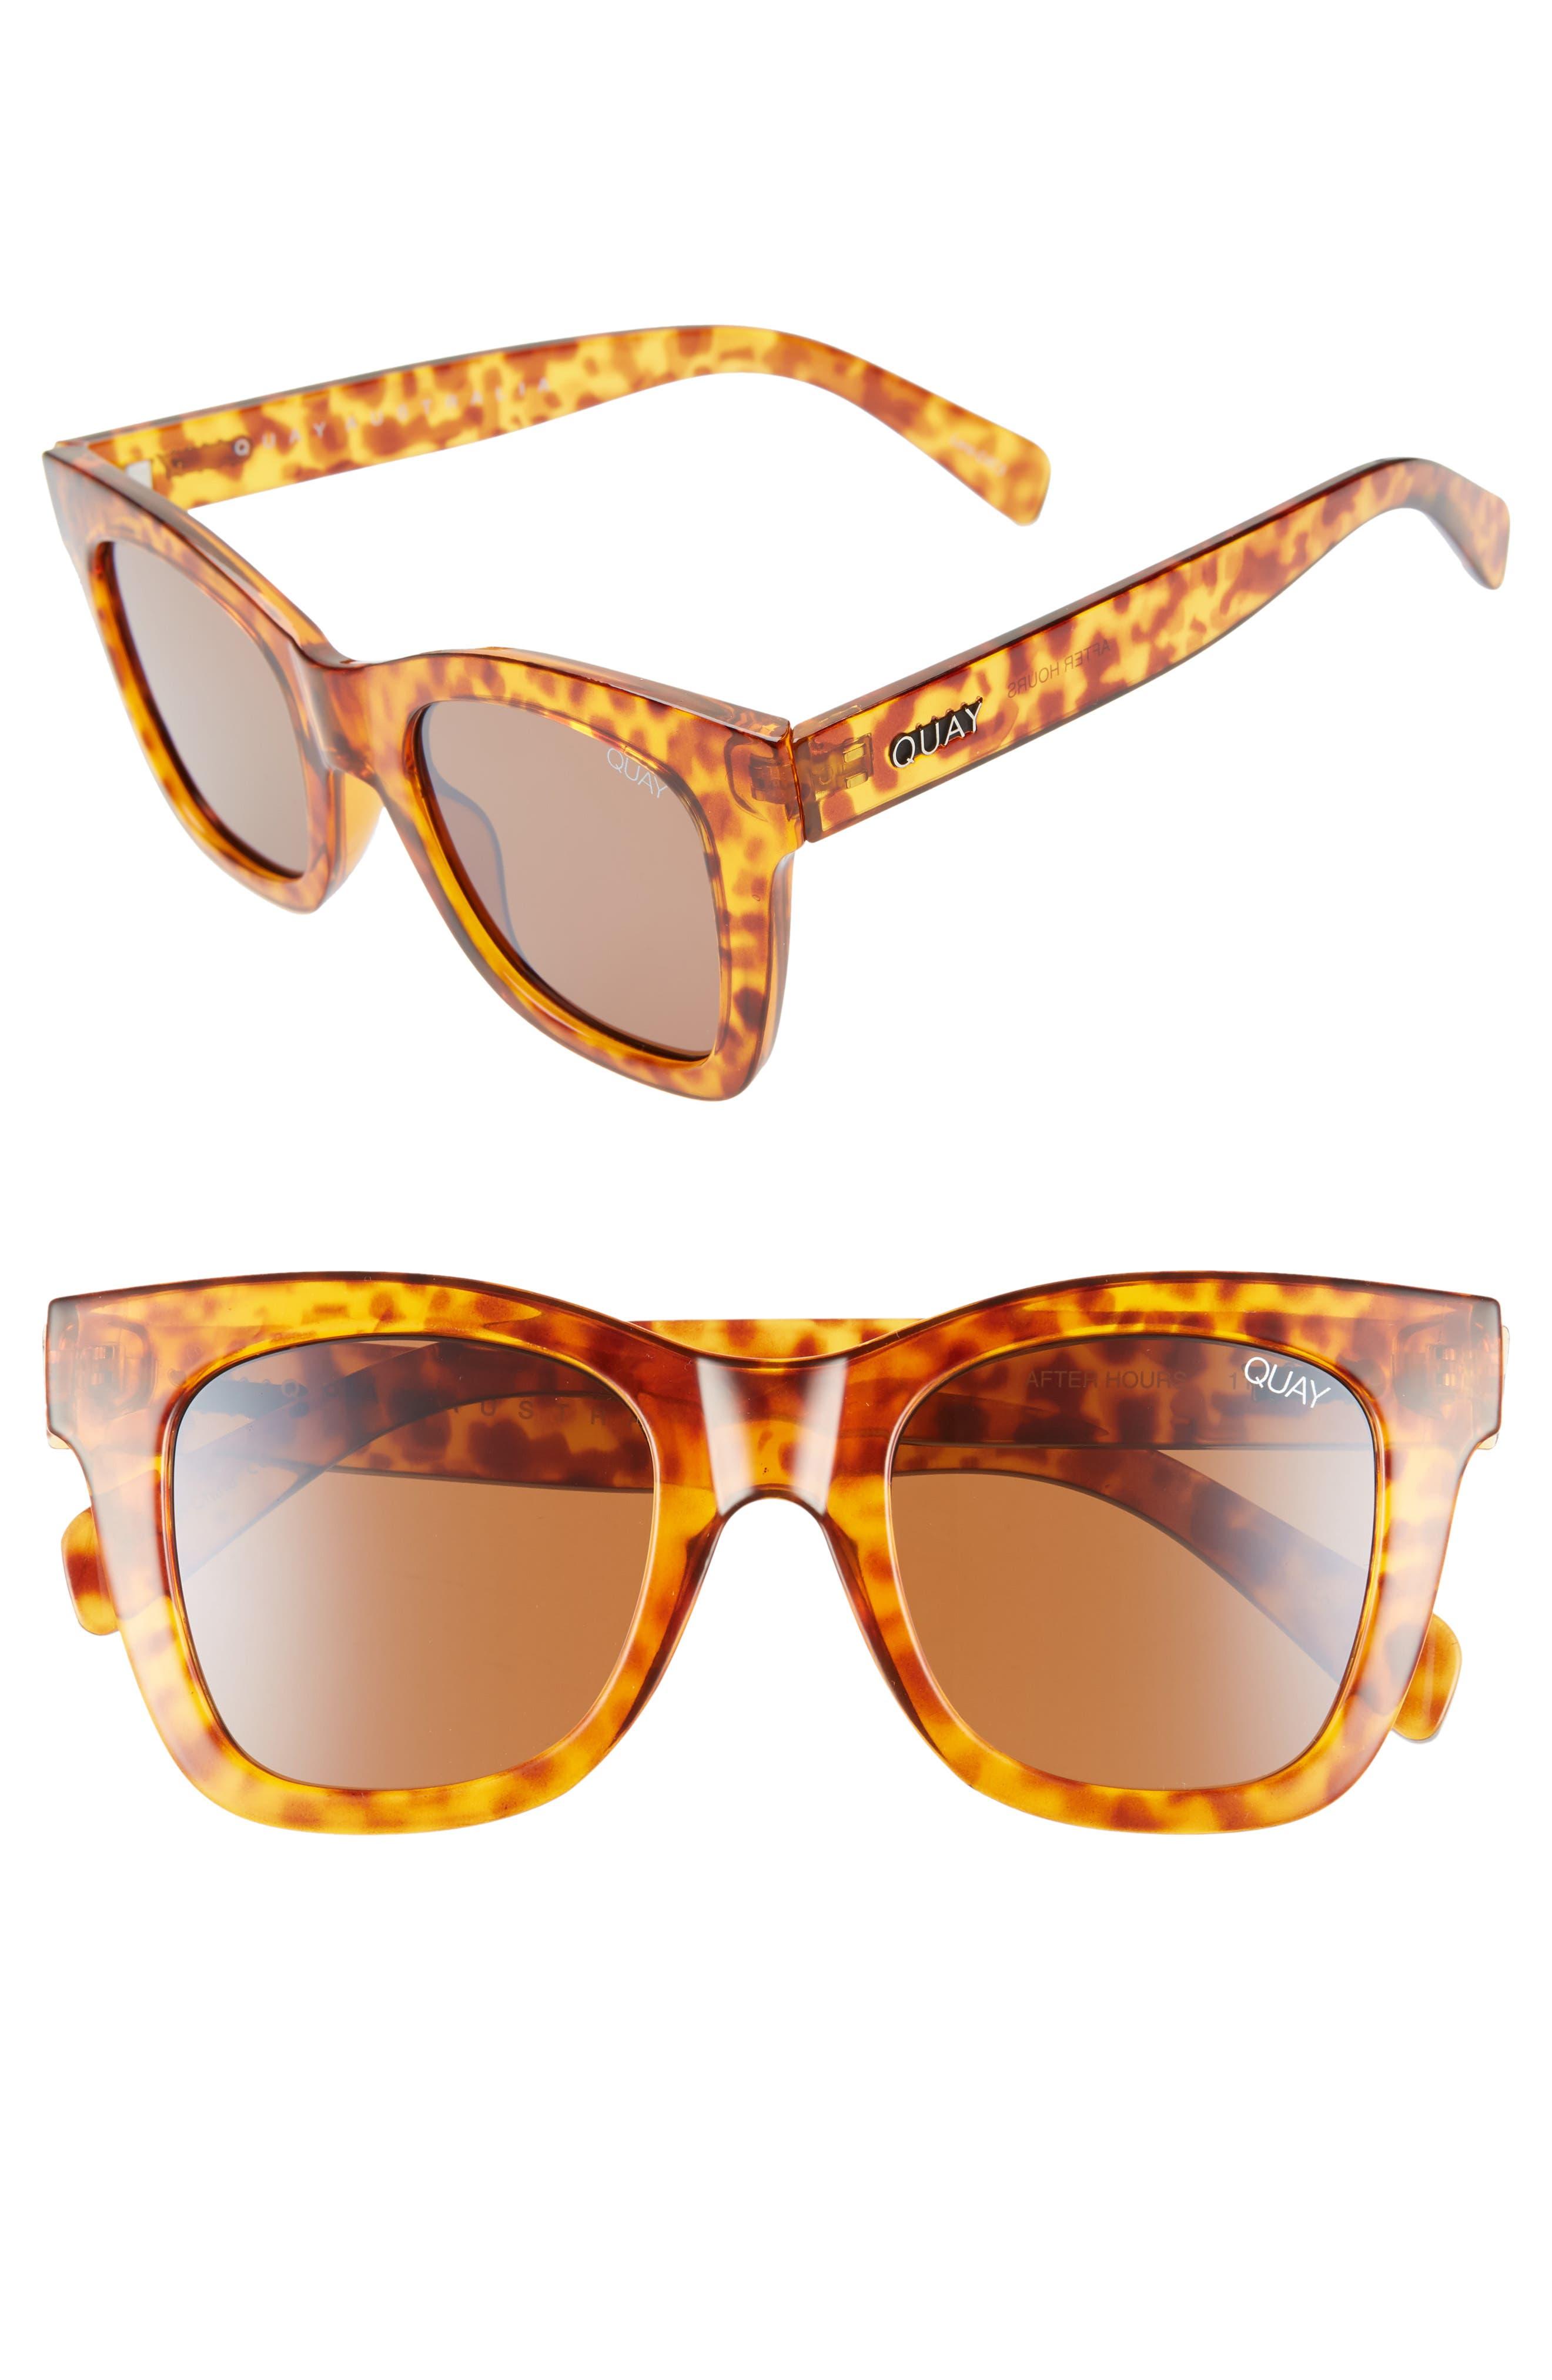 Quay Australia After Hours 50Mm Square Sunglasses - Orange Tort / Brown